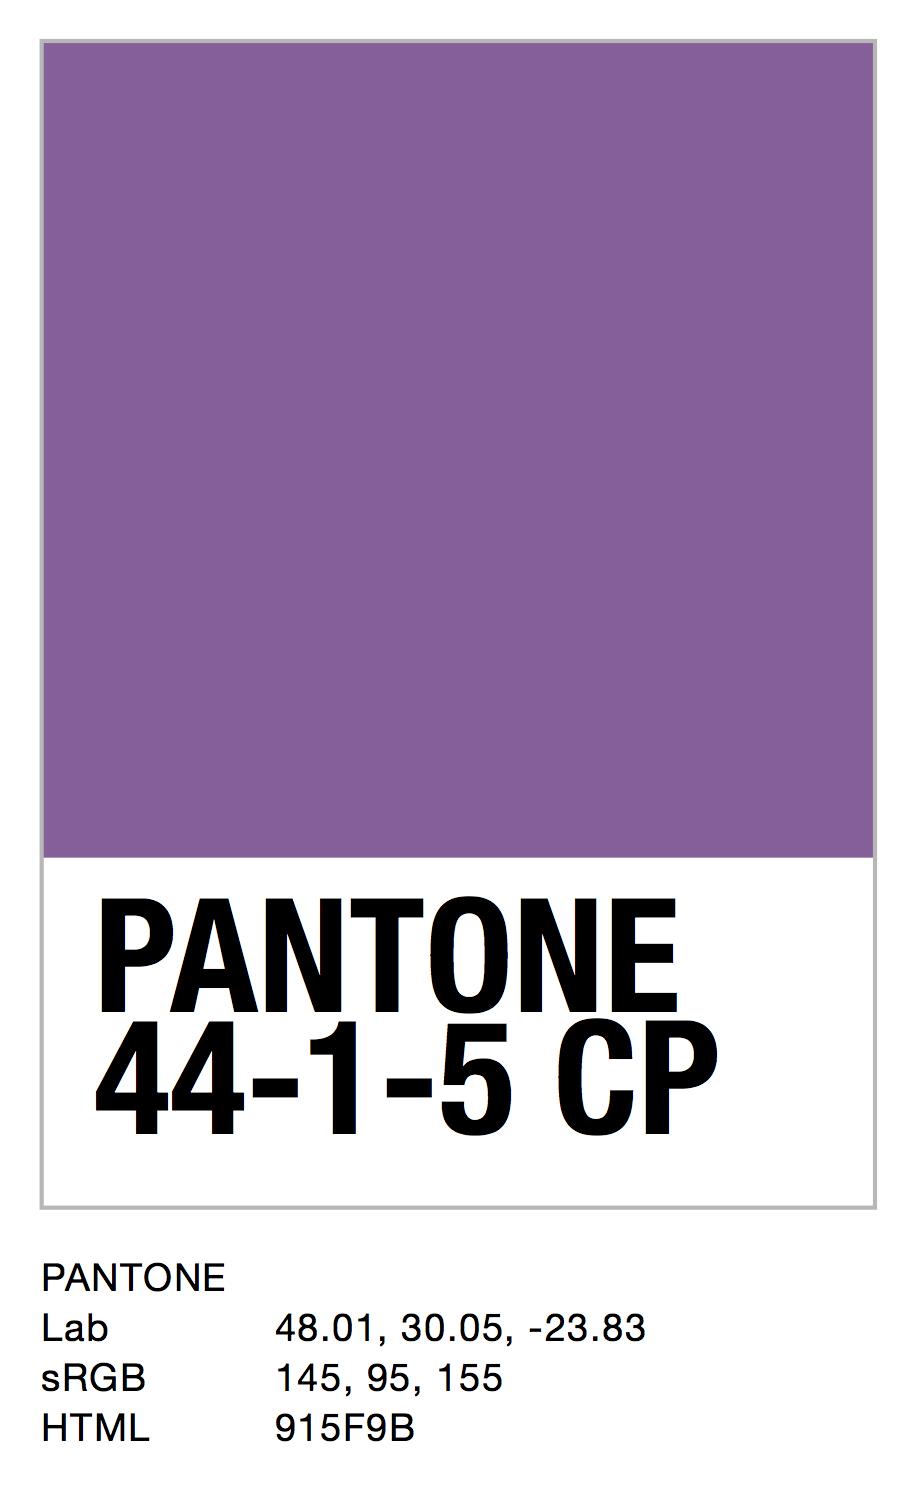 PANTONE 44-1-5 CP.jpg